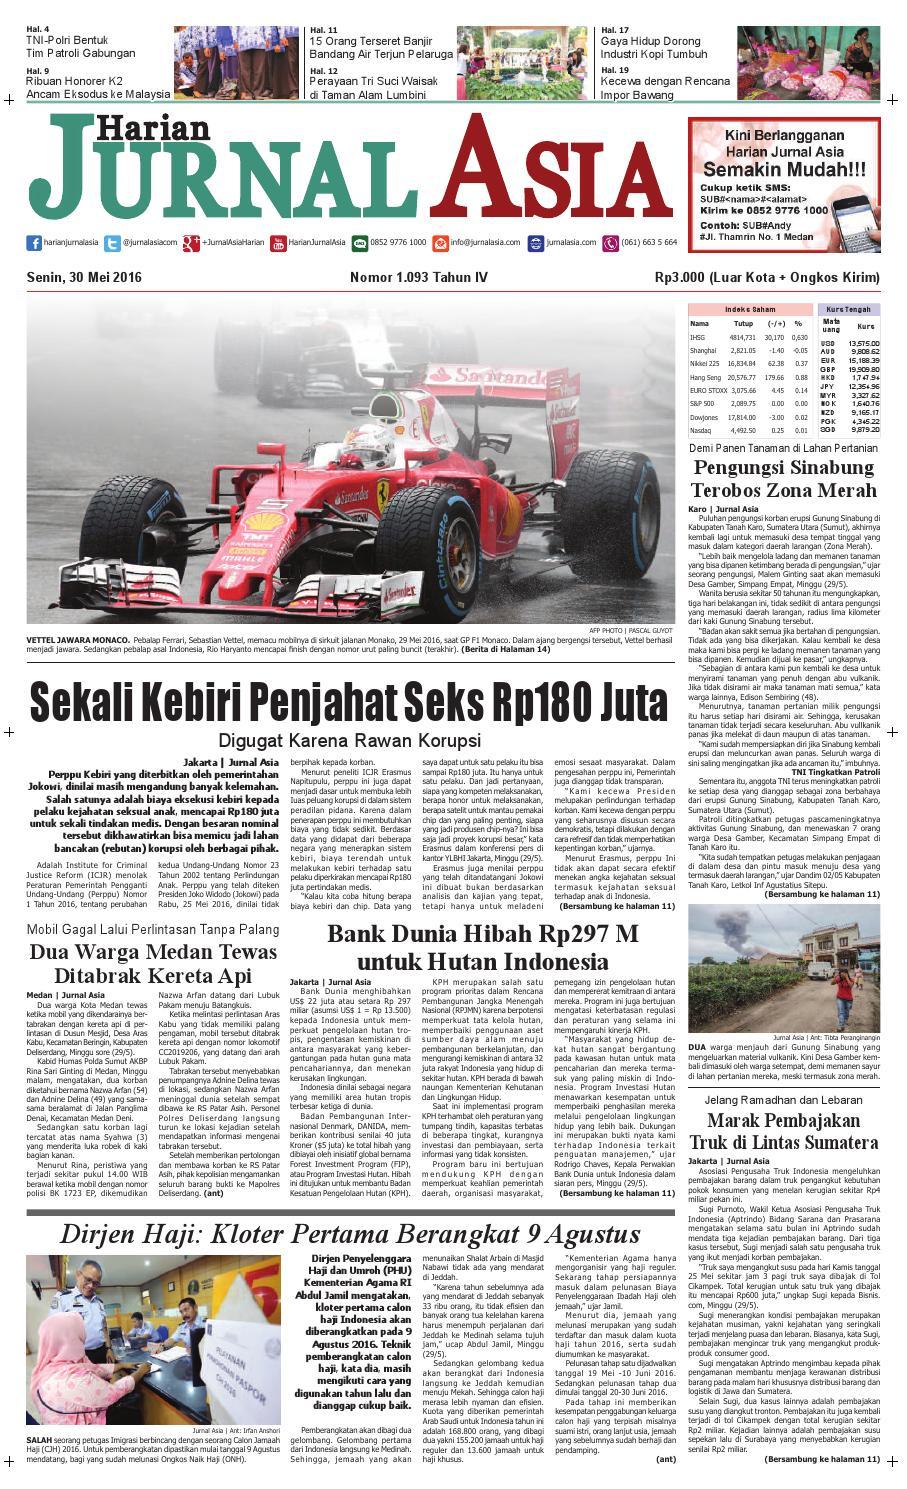 Harian Jurnal Asia Edisi Senin 30 Mei 2016 By Produk Ukm Bumn Tas Phiton Kembang Orchid Medan Issuu